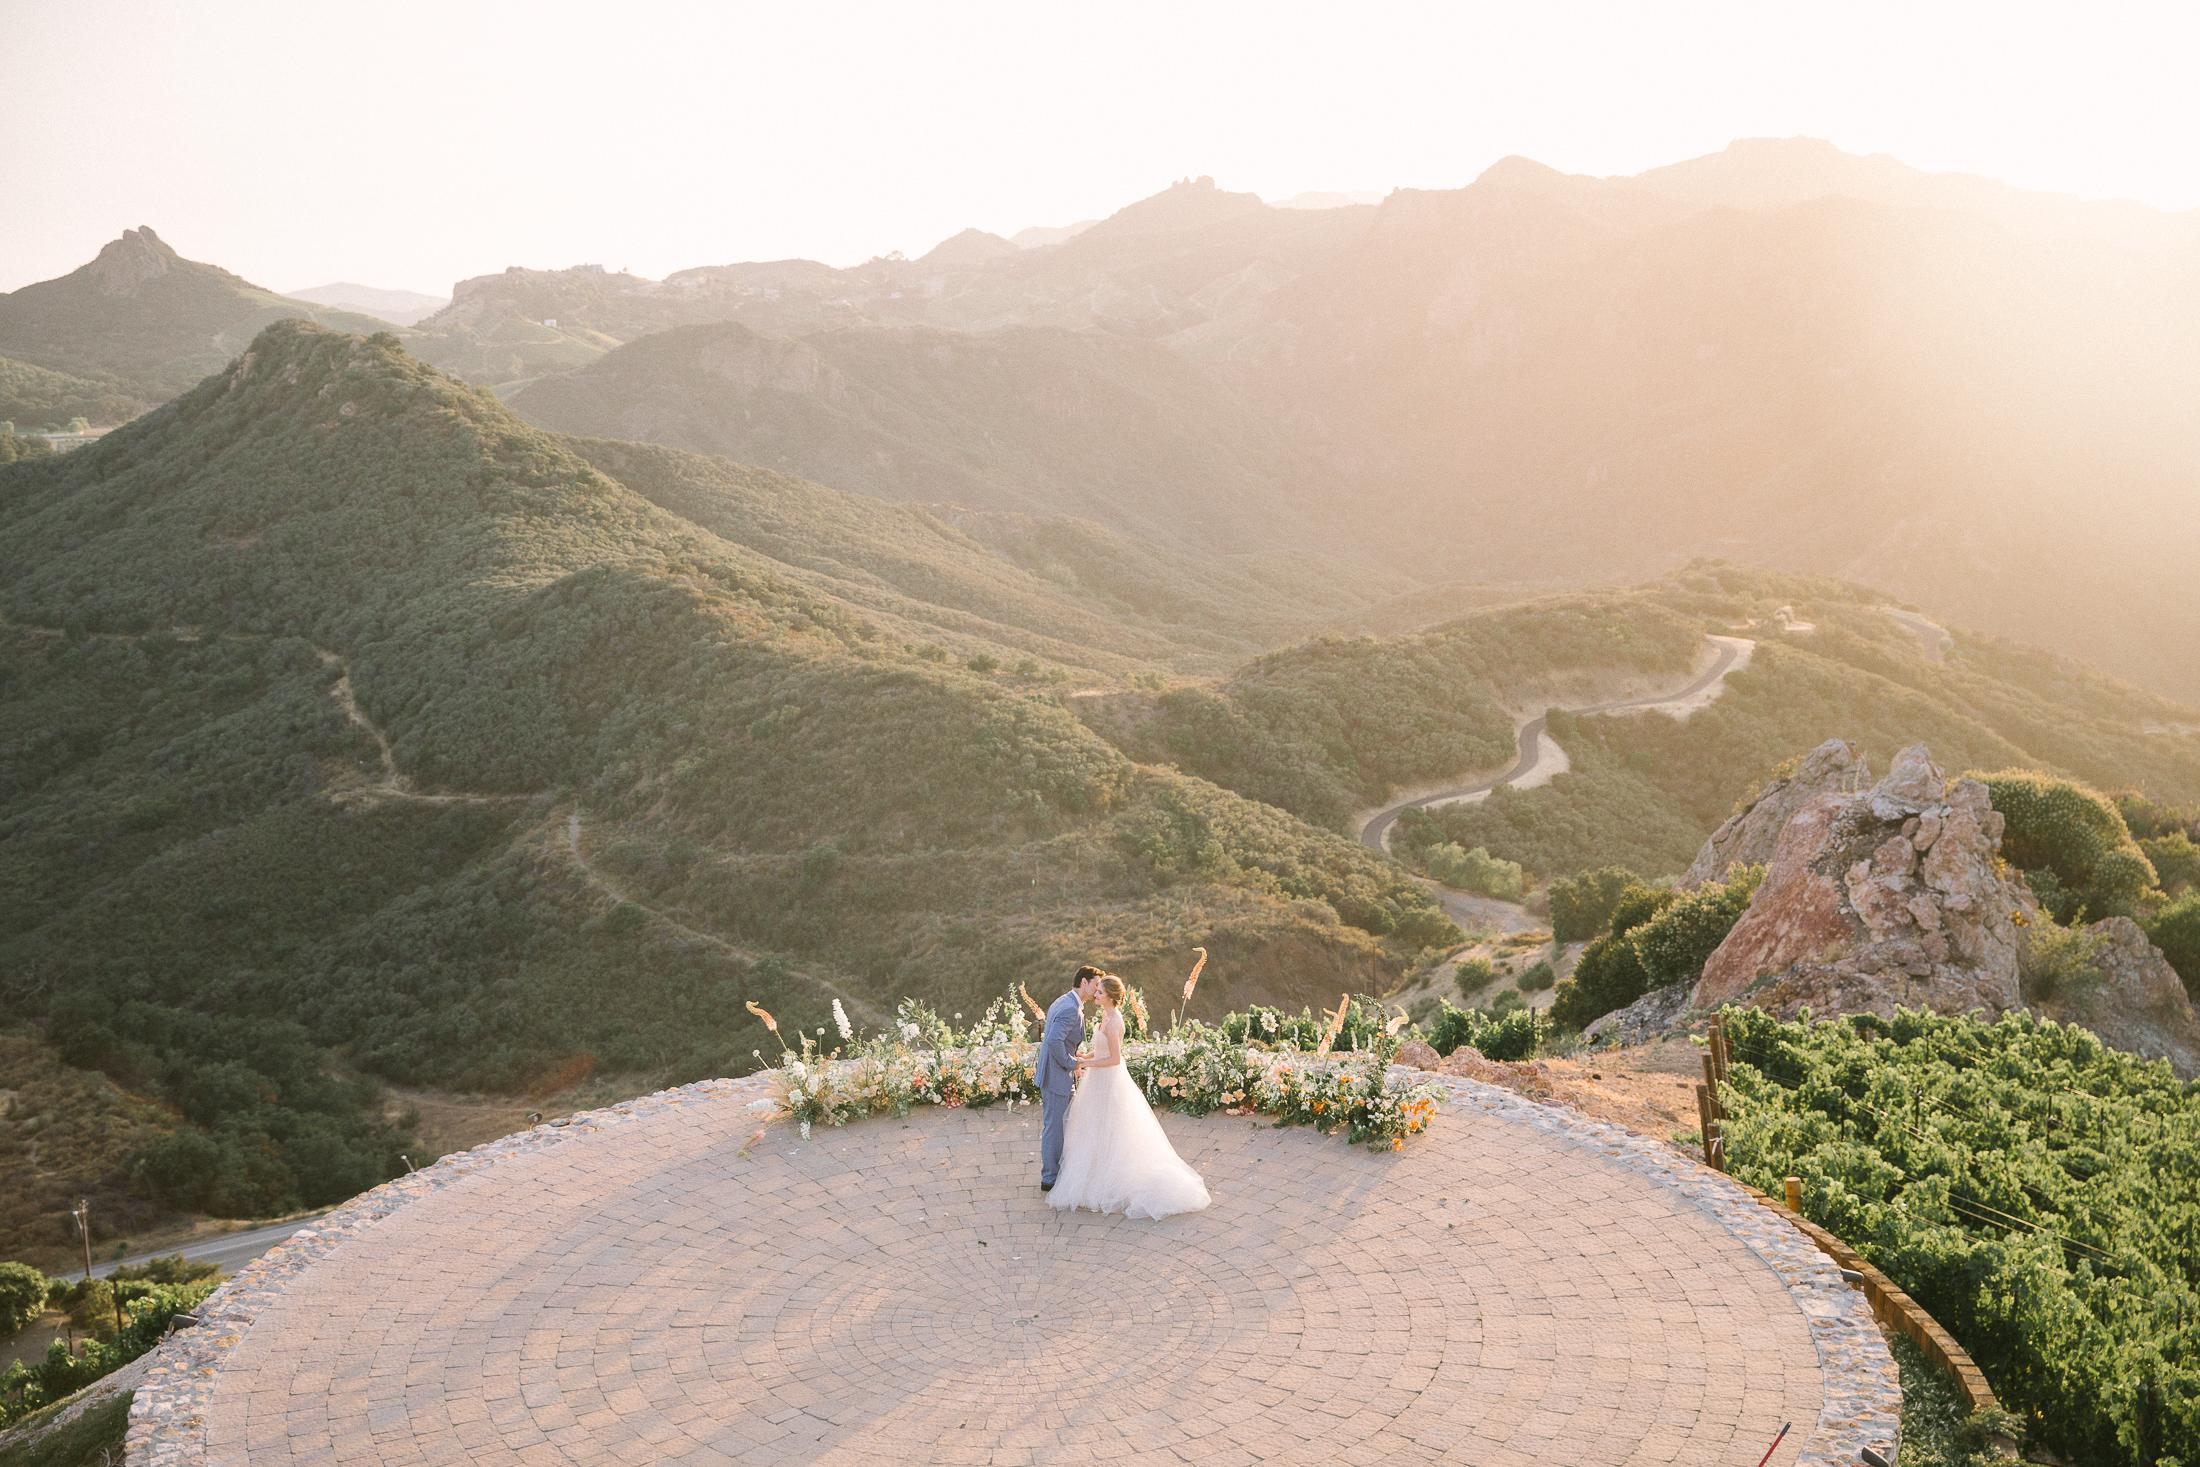 Ellen-Ashton-Photography-California-Wedding-Photographer-Malibu-Rocky-Oaks-Weddings-girt-and-gold44.jpg